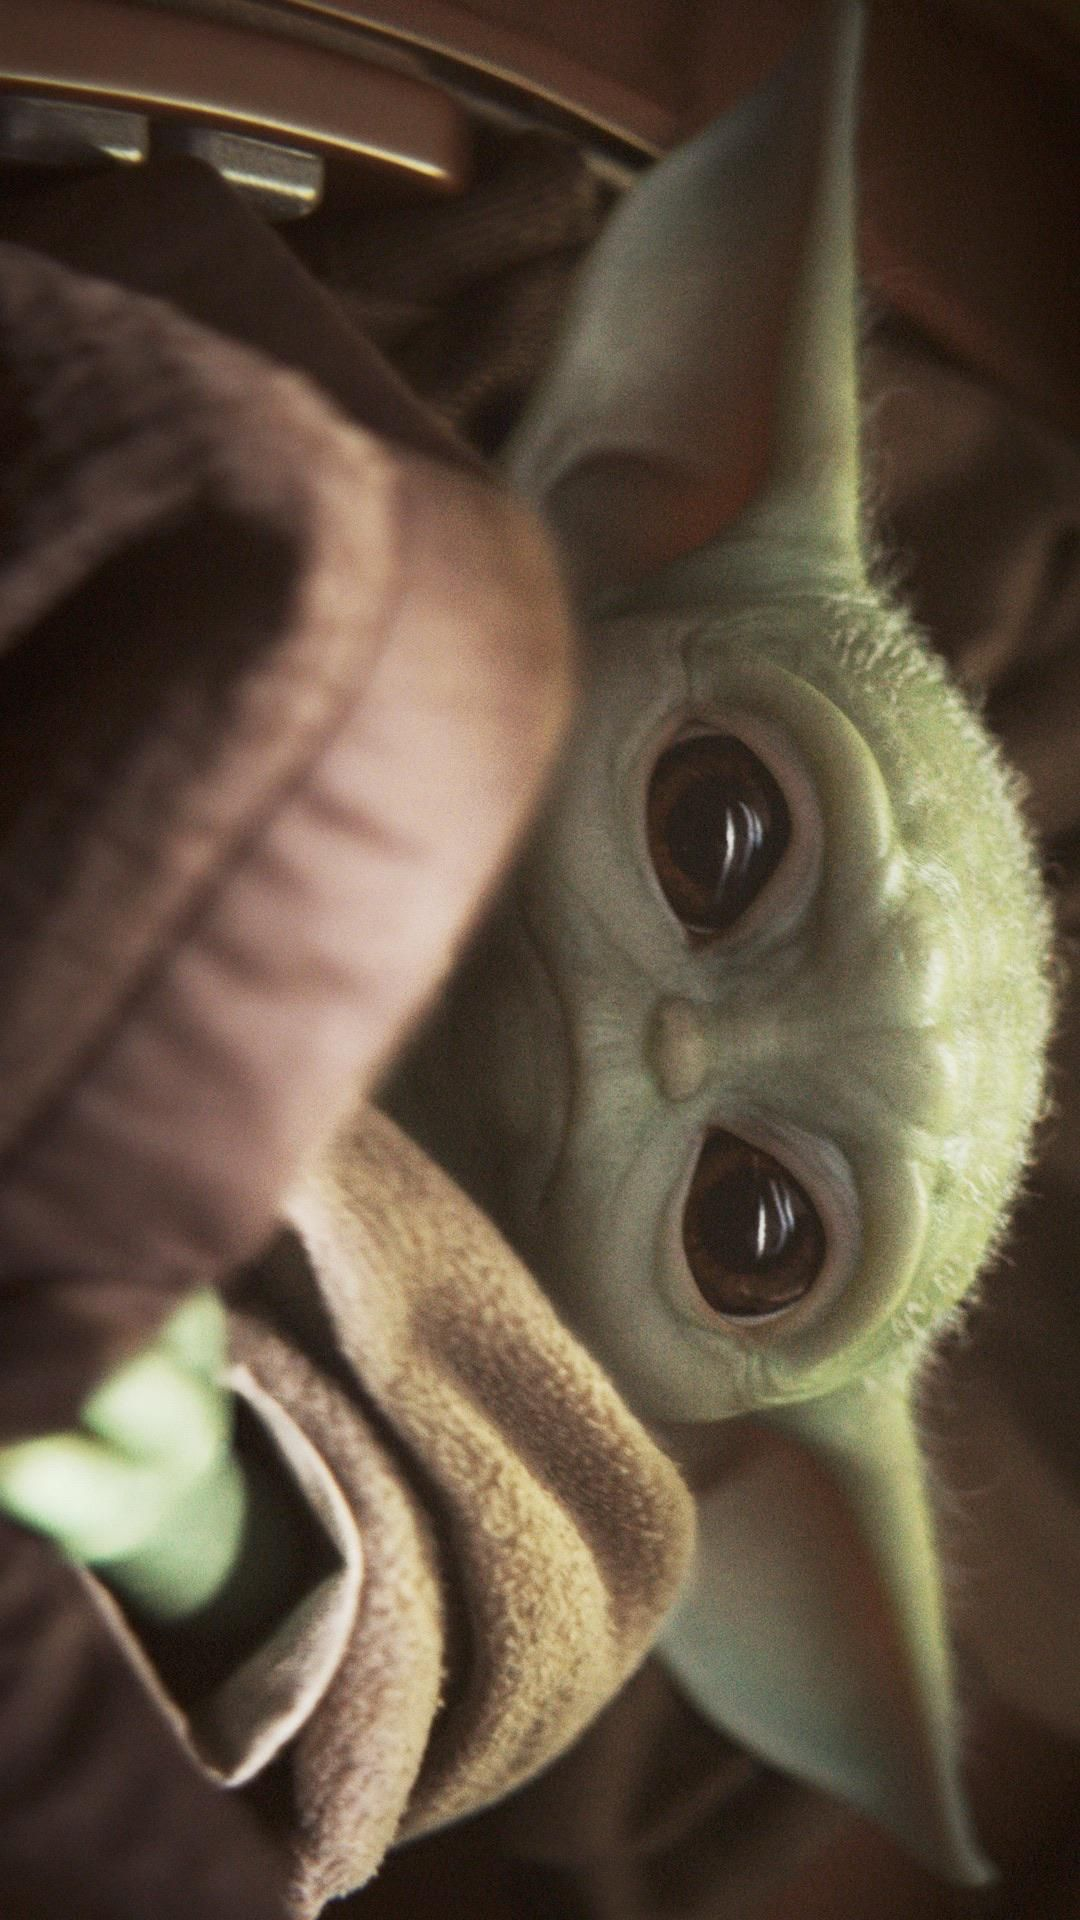 If baby Baby yoda isn't your wallpaper do you really have a wallpaper | /r/BabyYoda | Baby Yoda